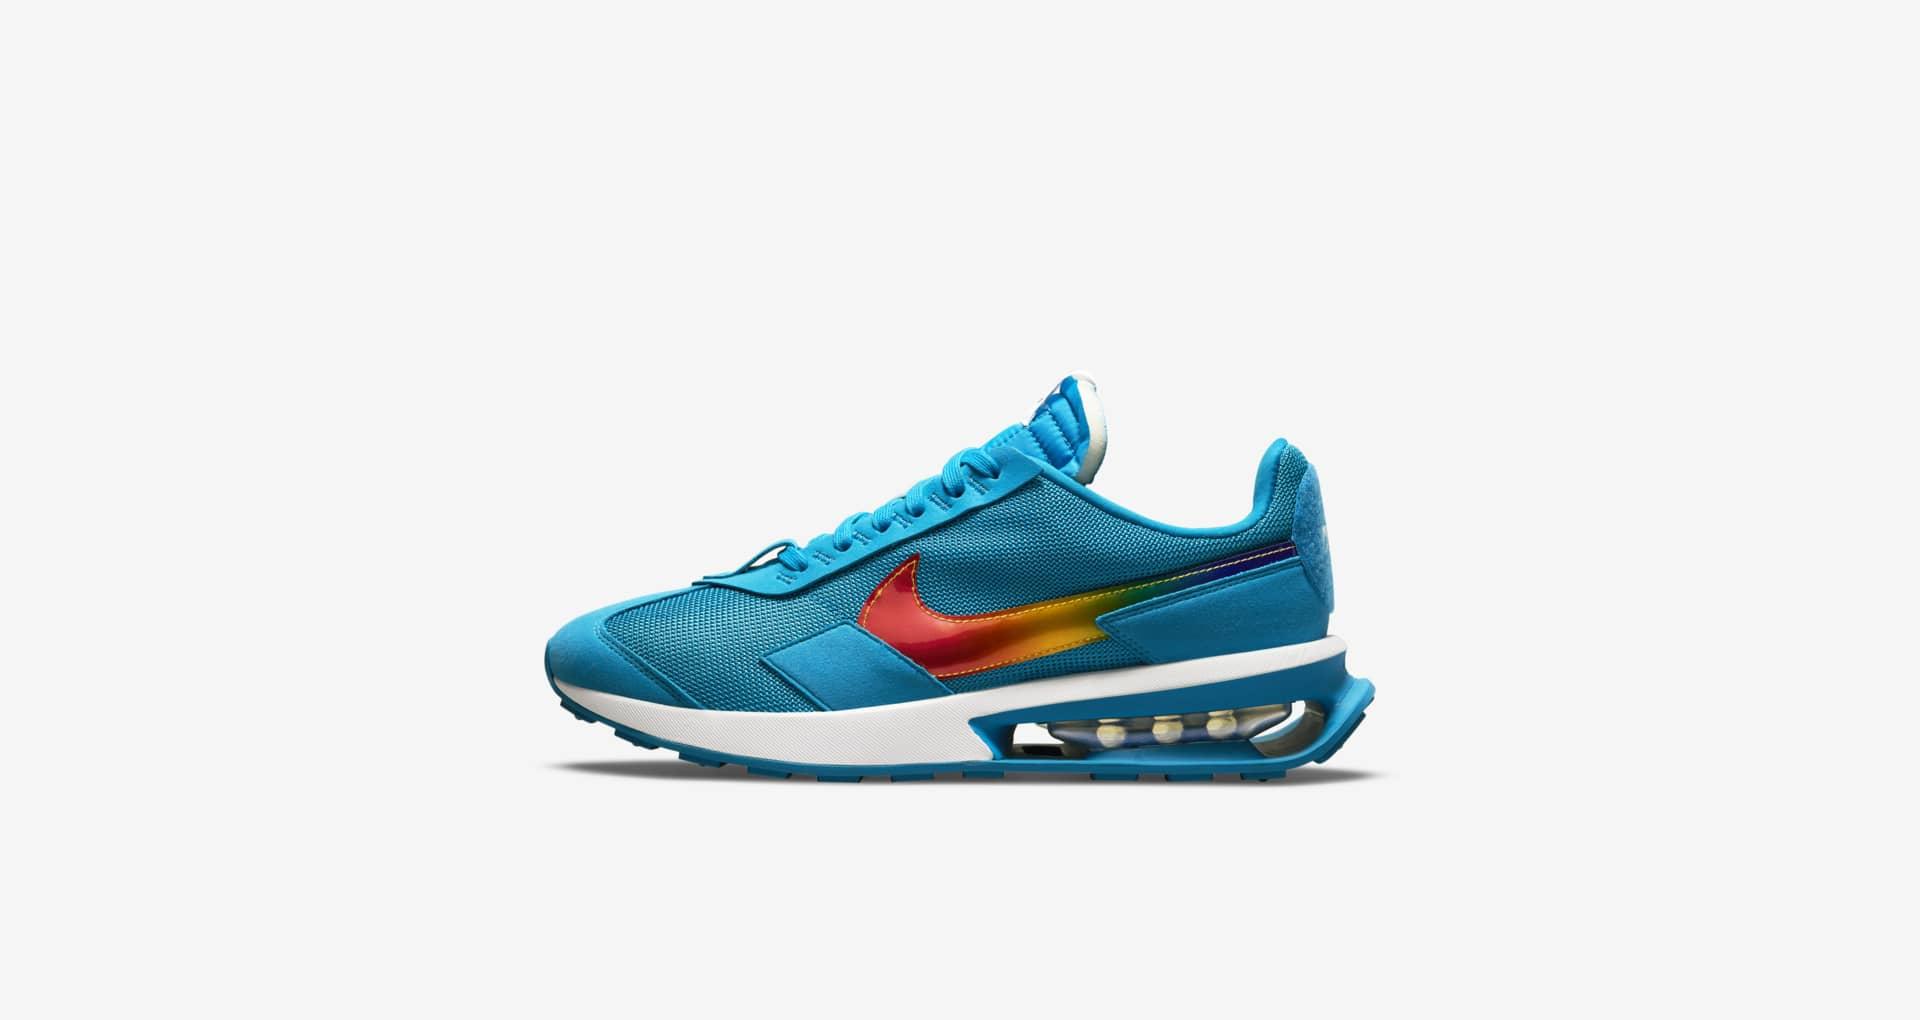 Nike,Air Max Pre-Day,DD3025-40  彩虹 Swoosh!全新 Nike Air Max Pre-Day 即将发售!